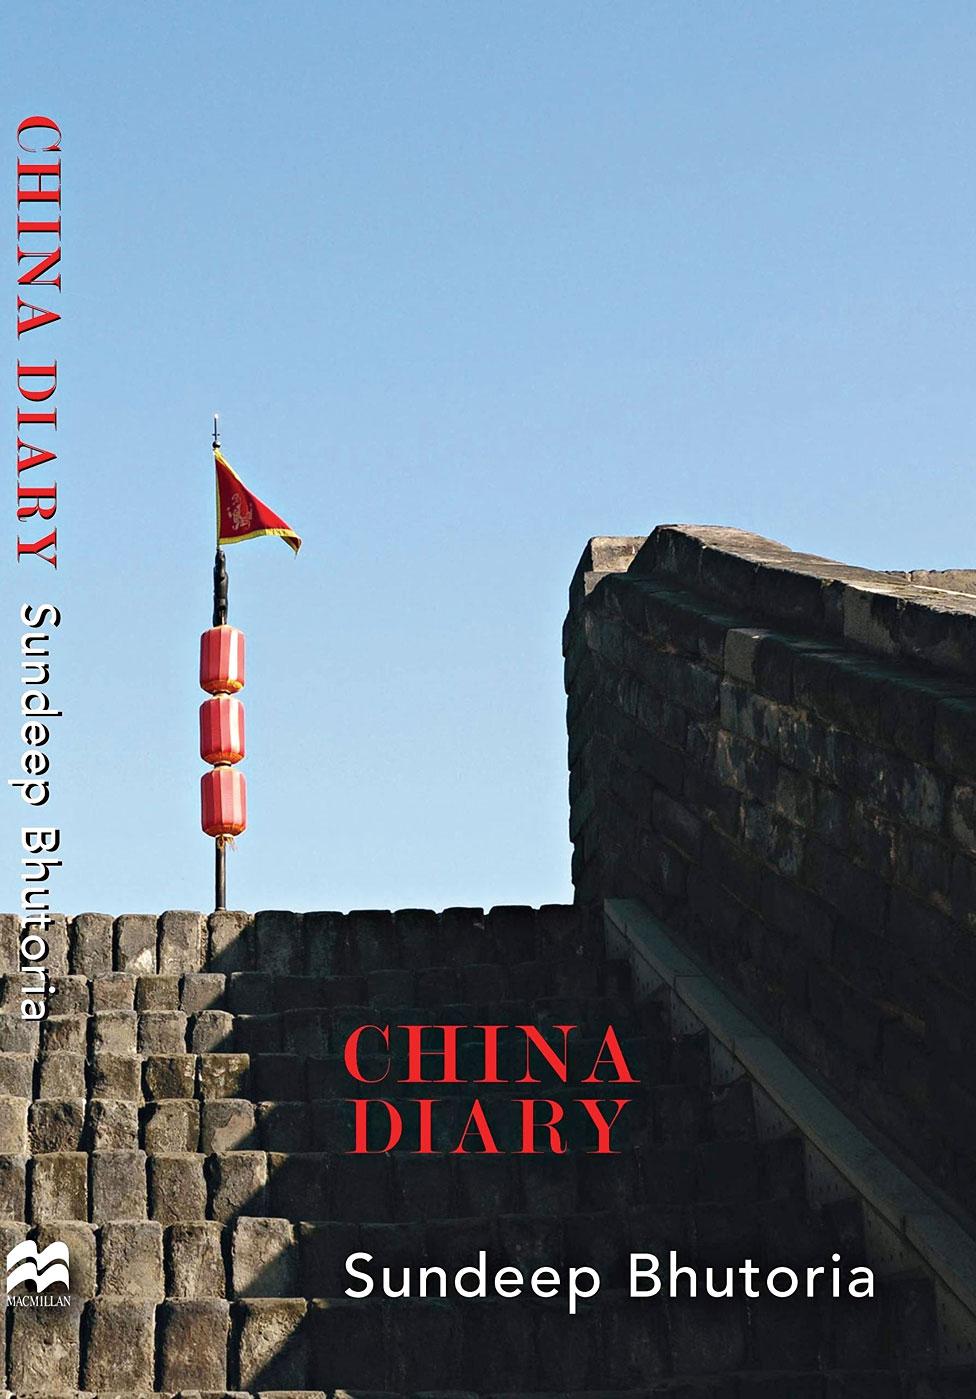 China Diary; Sundeep Bhutoria; Pan Macmillan; Rs 799